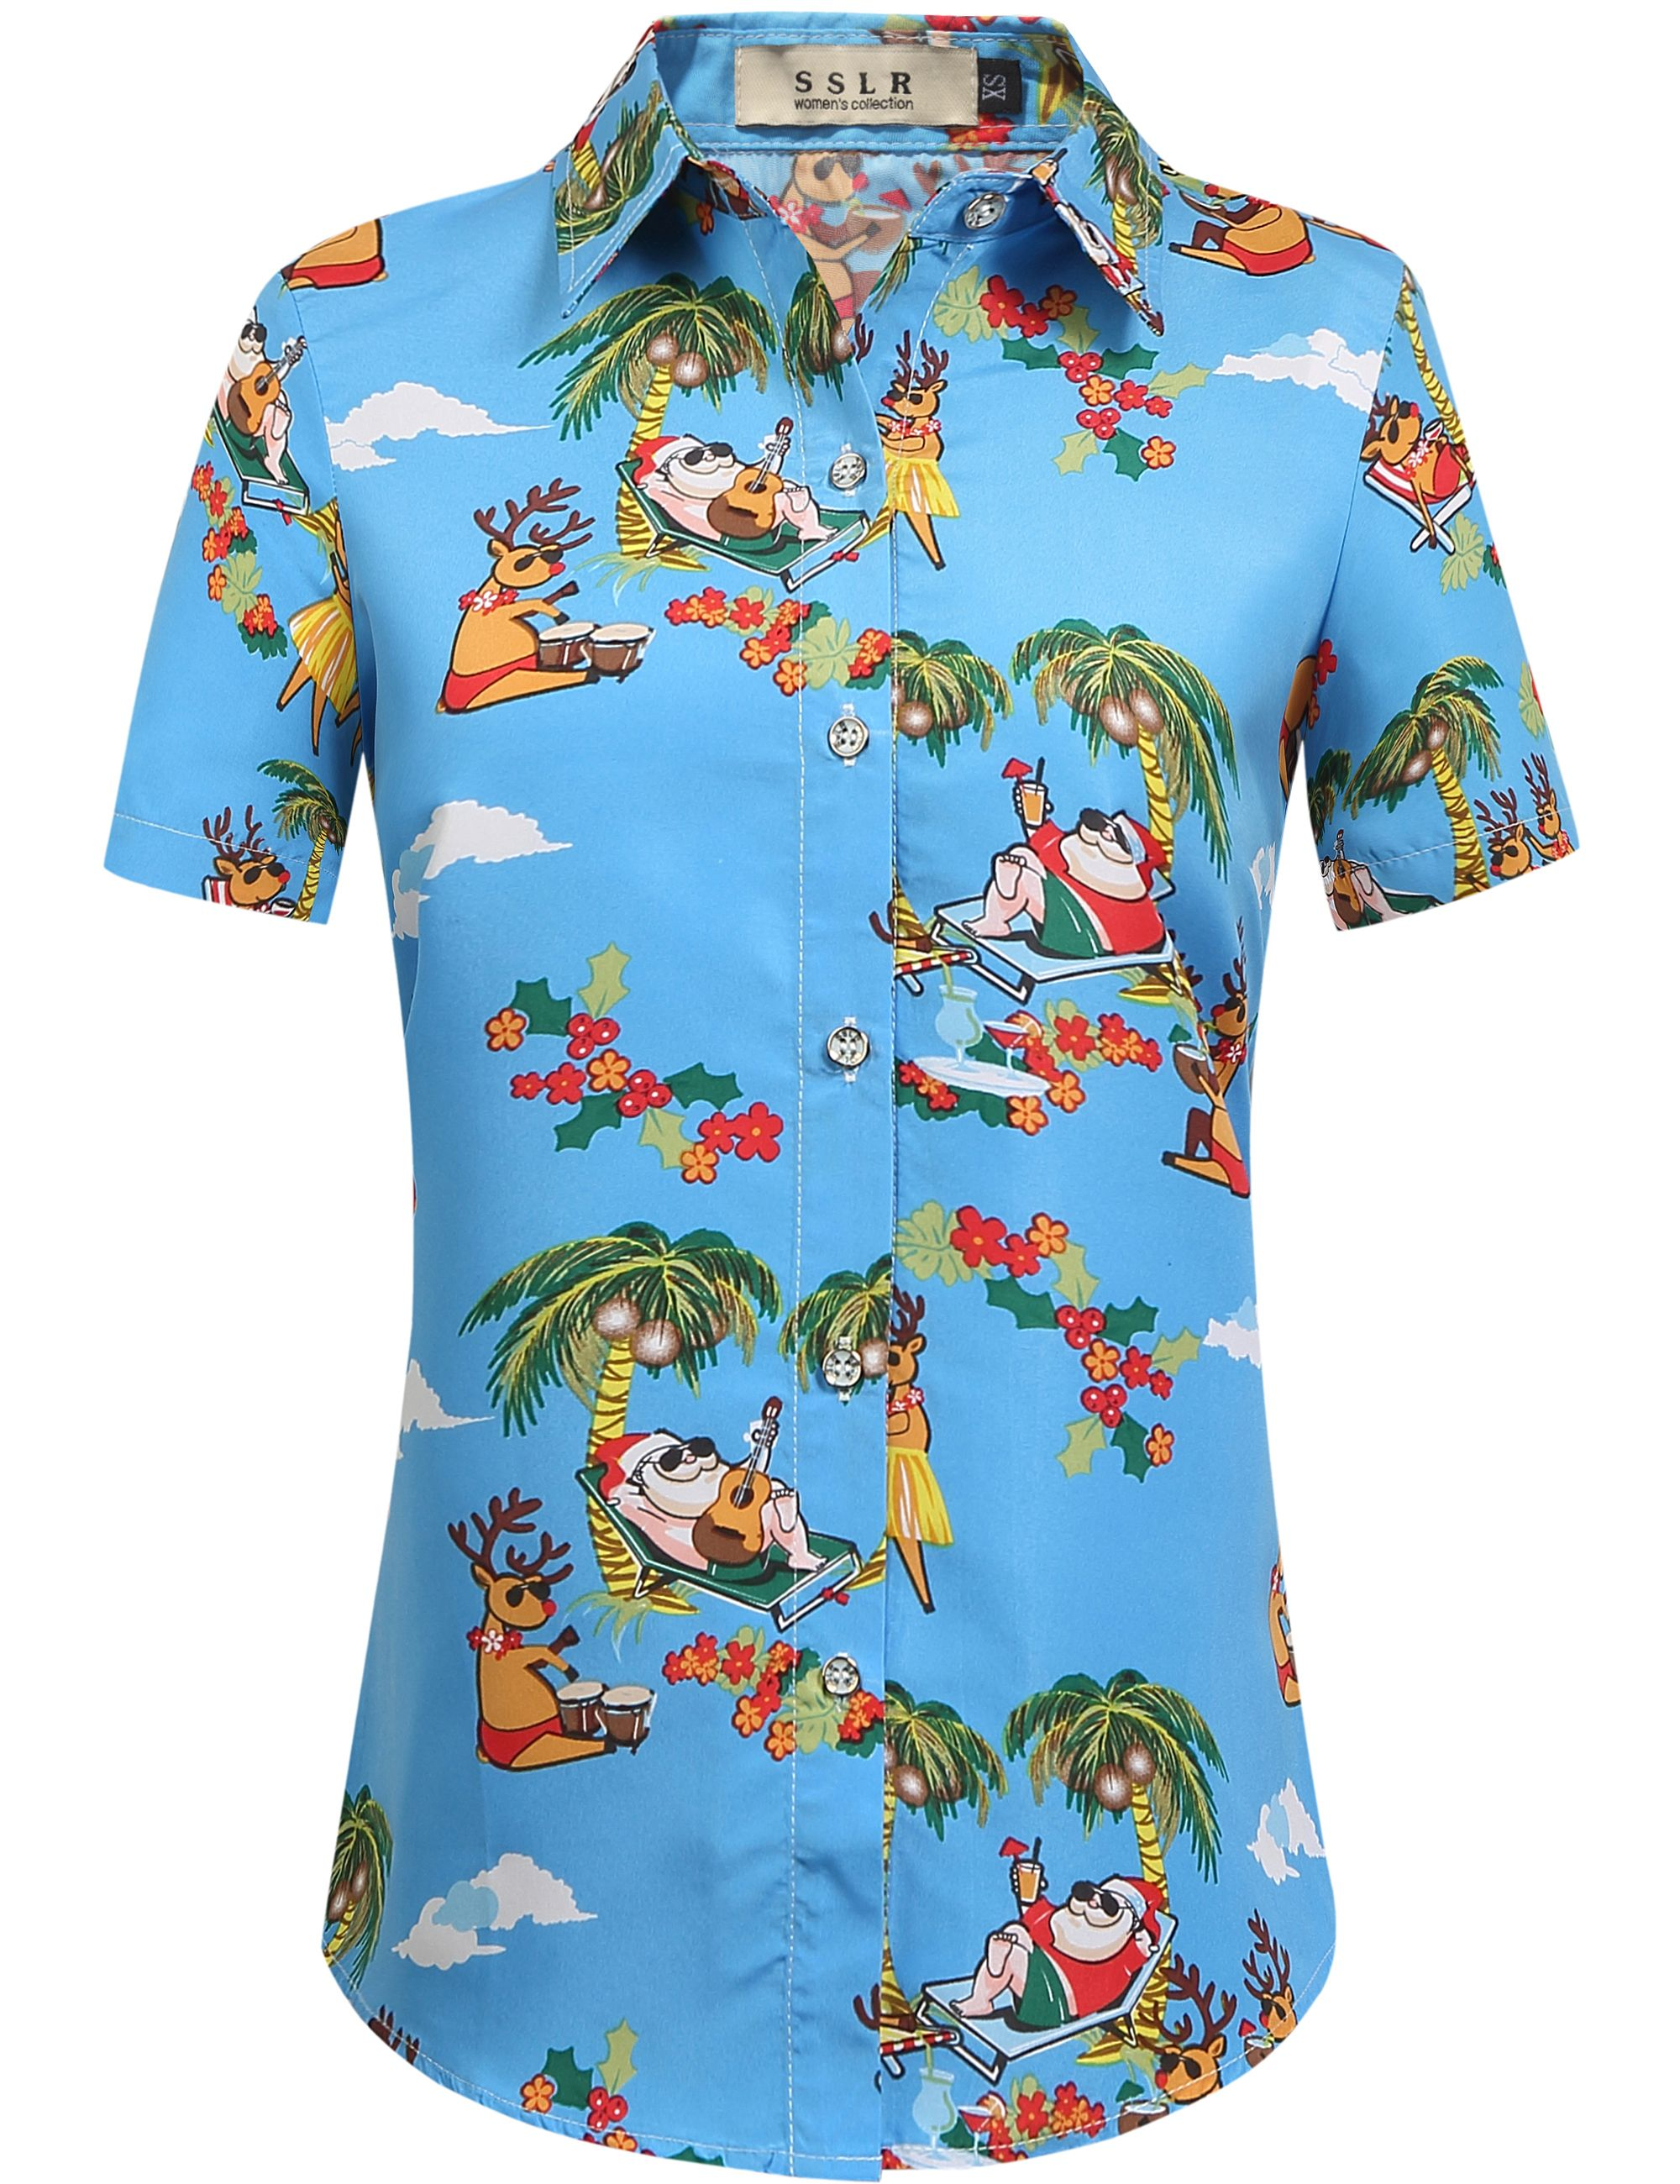 ef6de071 Women's Tropical Party Hawaiian Christmas Shirt #tropical #hawaiian # christmas #shirt